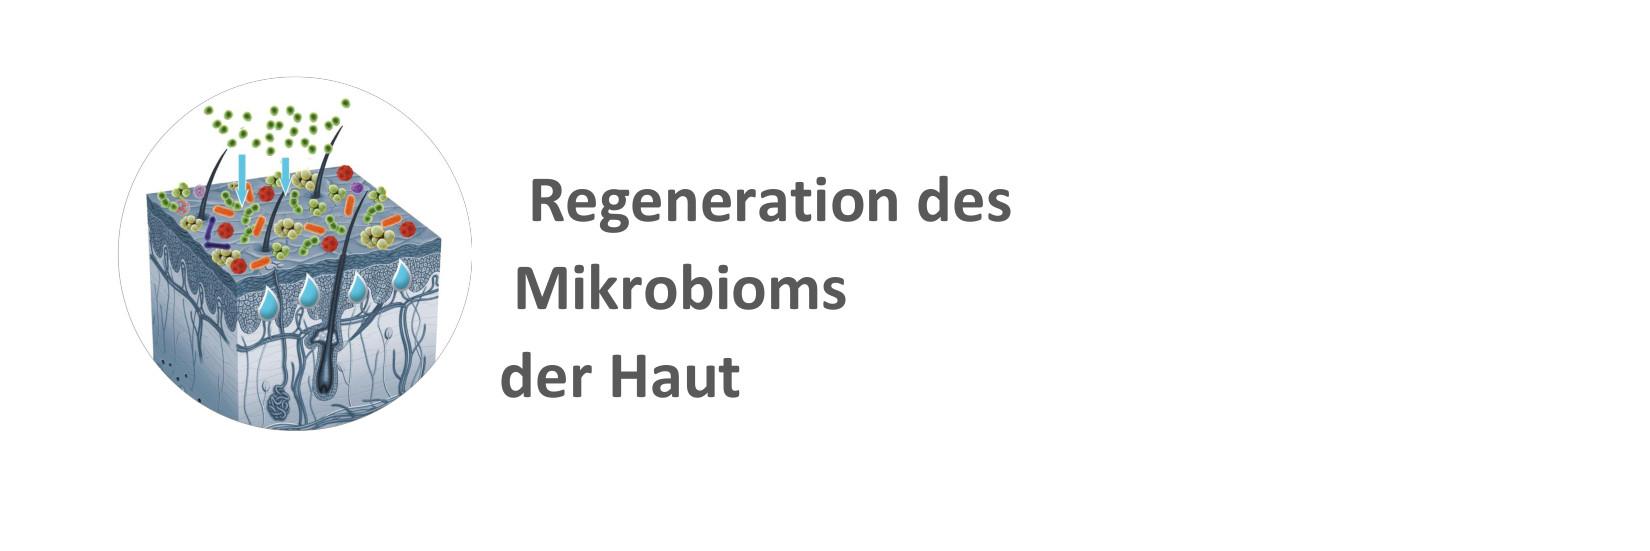 Microbiom der Haut_Apotheke am Herrfurthplatz